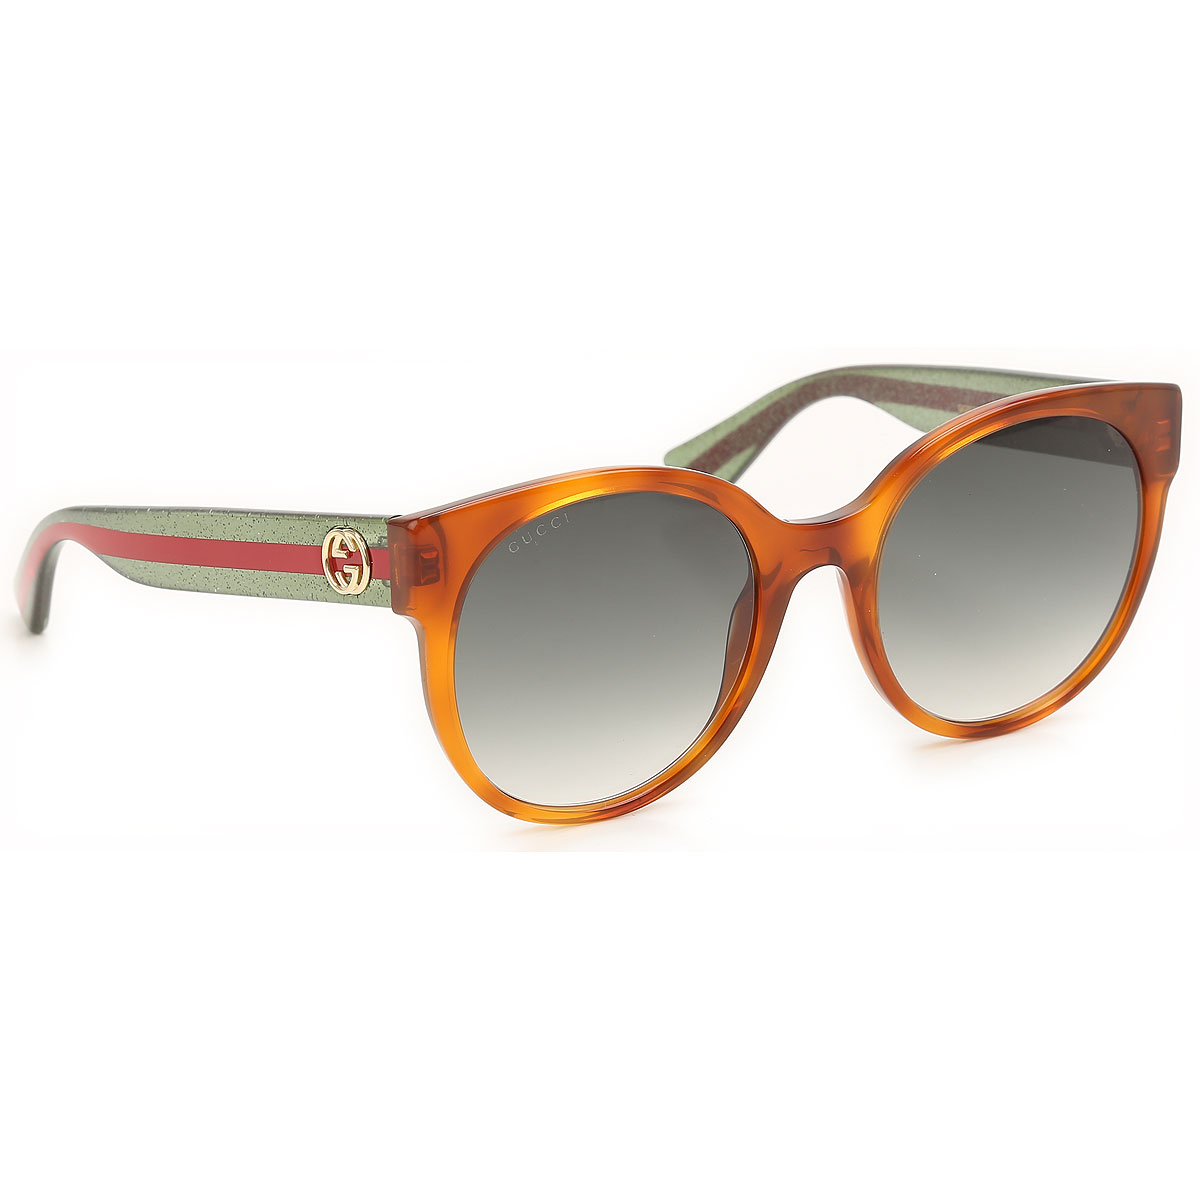 8bc6d8b0fd Gucci. Sunglasses